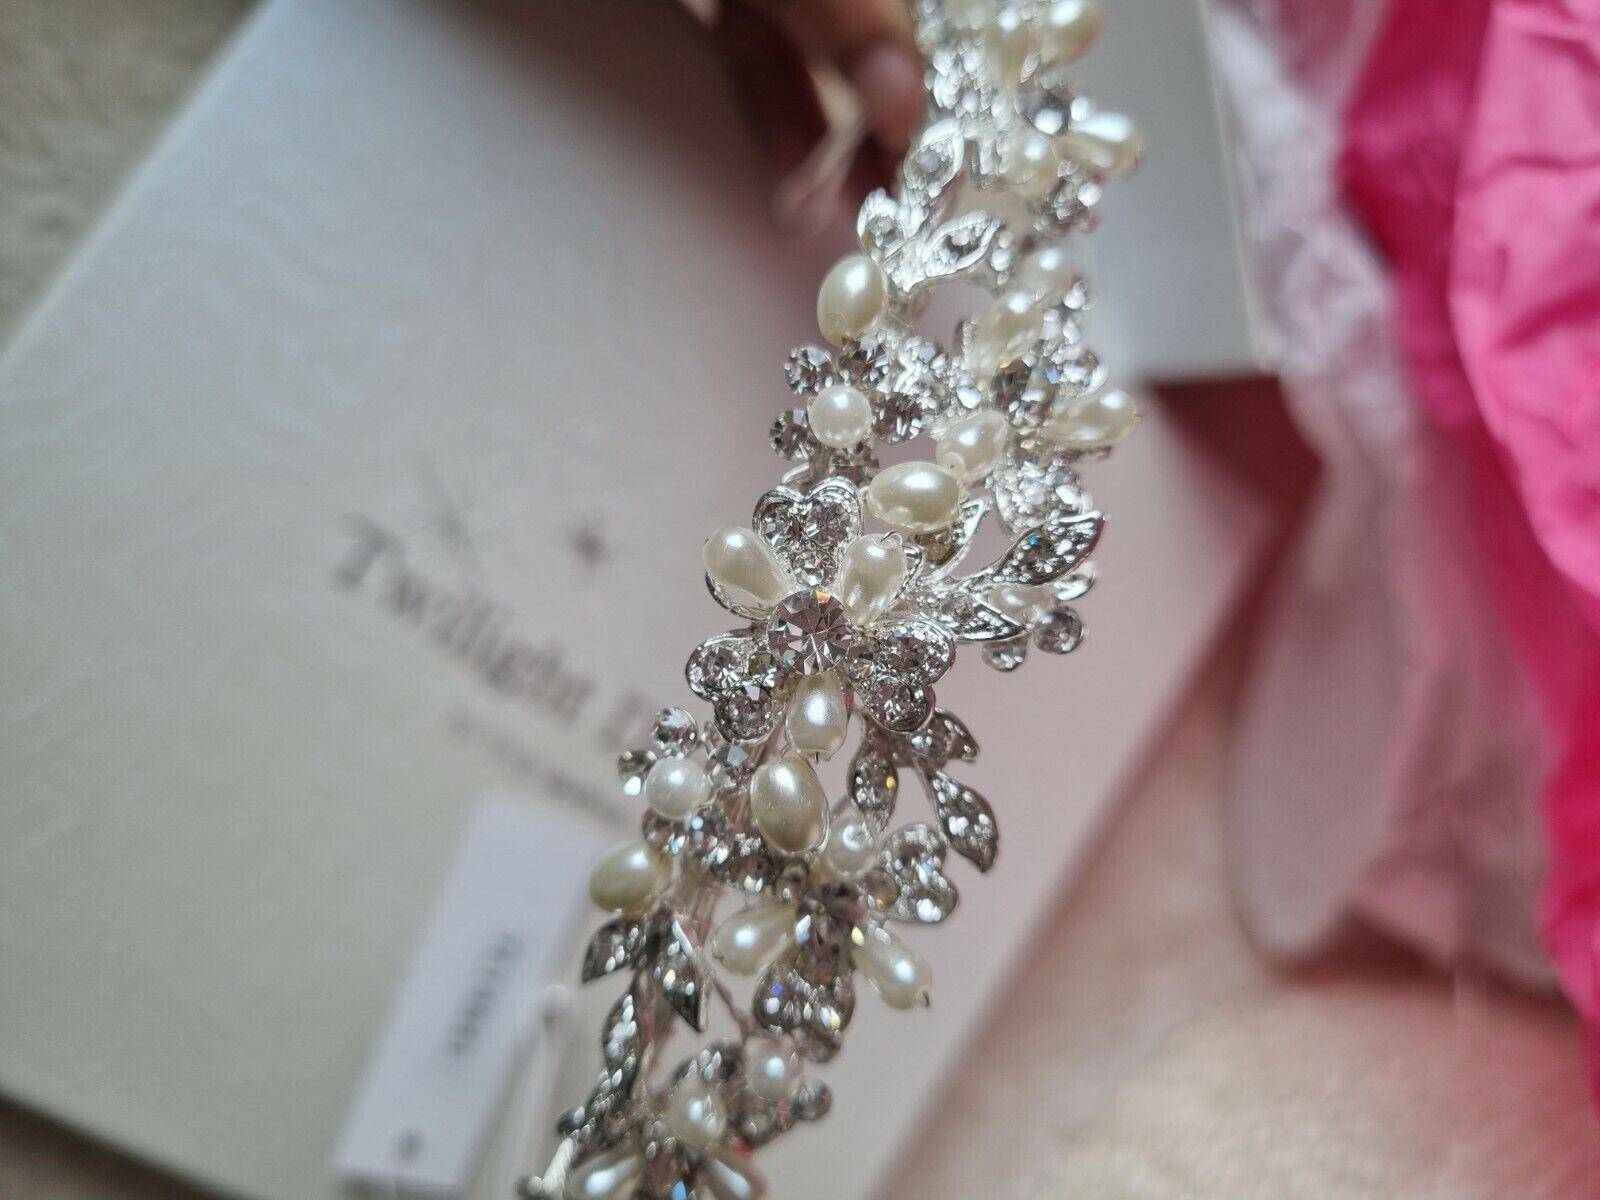 Twilight designs wedding tiara (Unused new with tags)